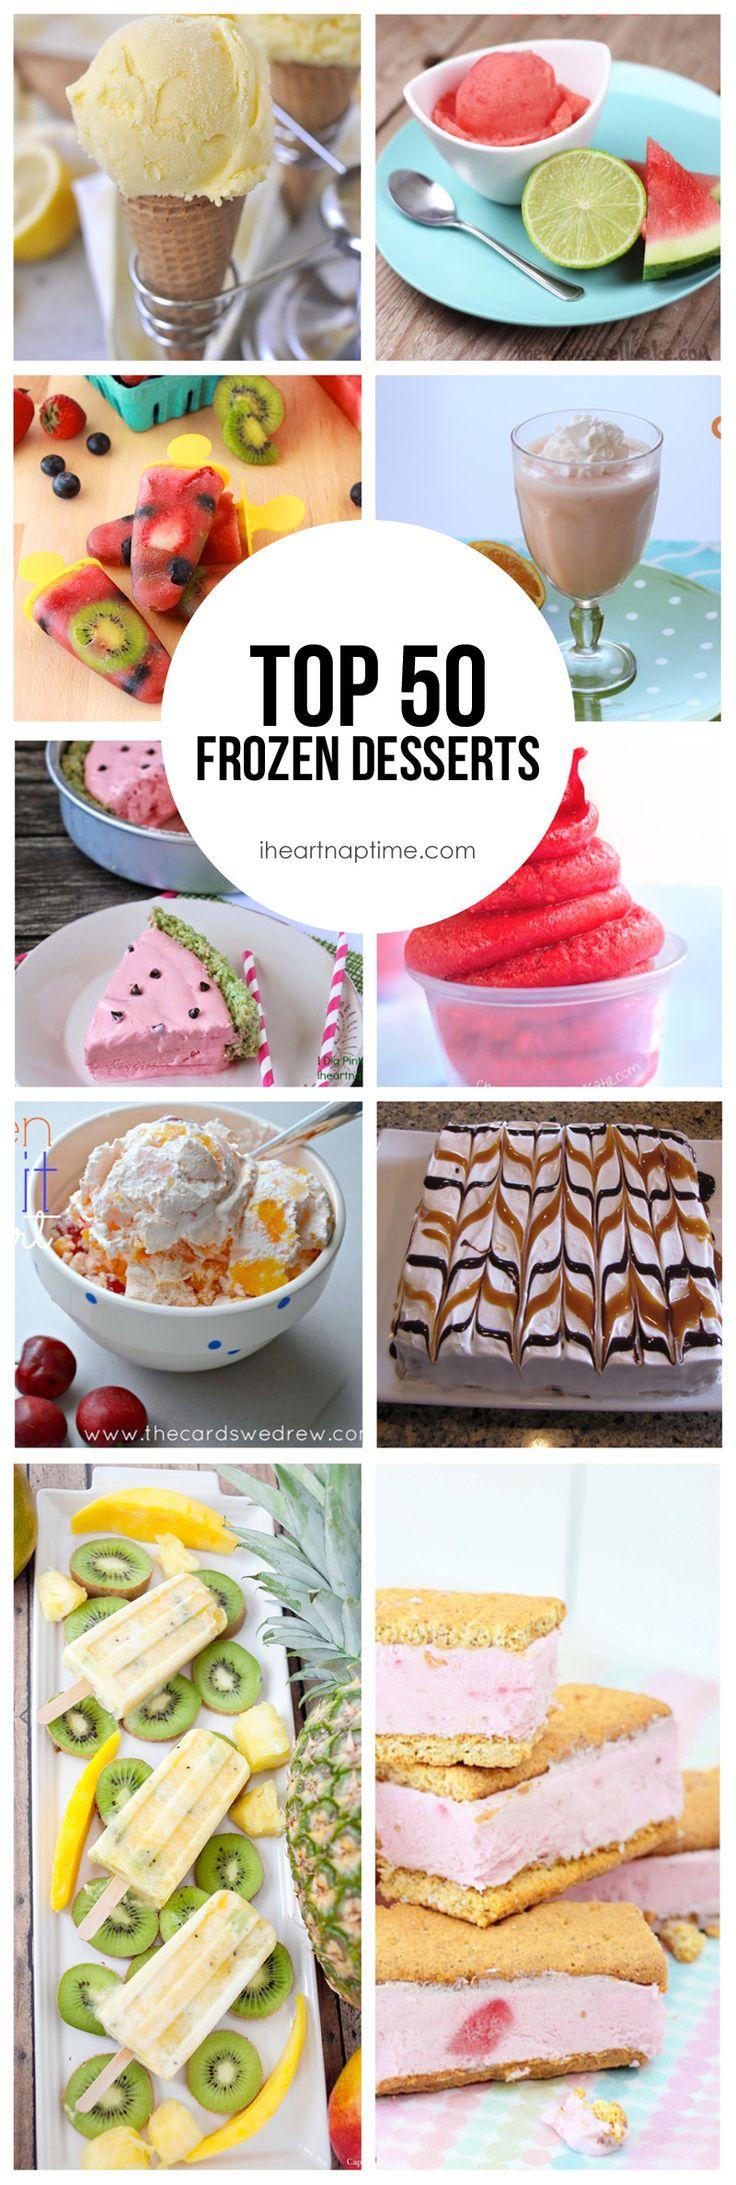 Top 50 Frozen Desserts on iheartnaptime.com